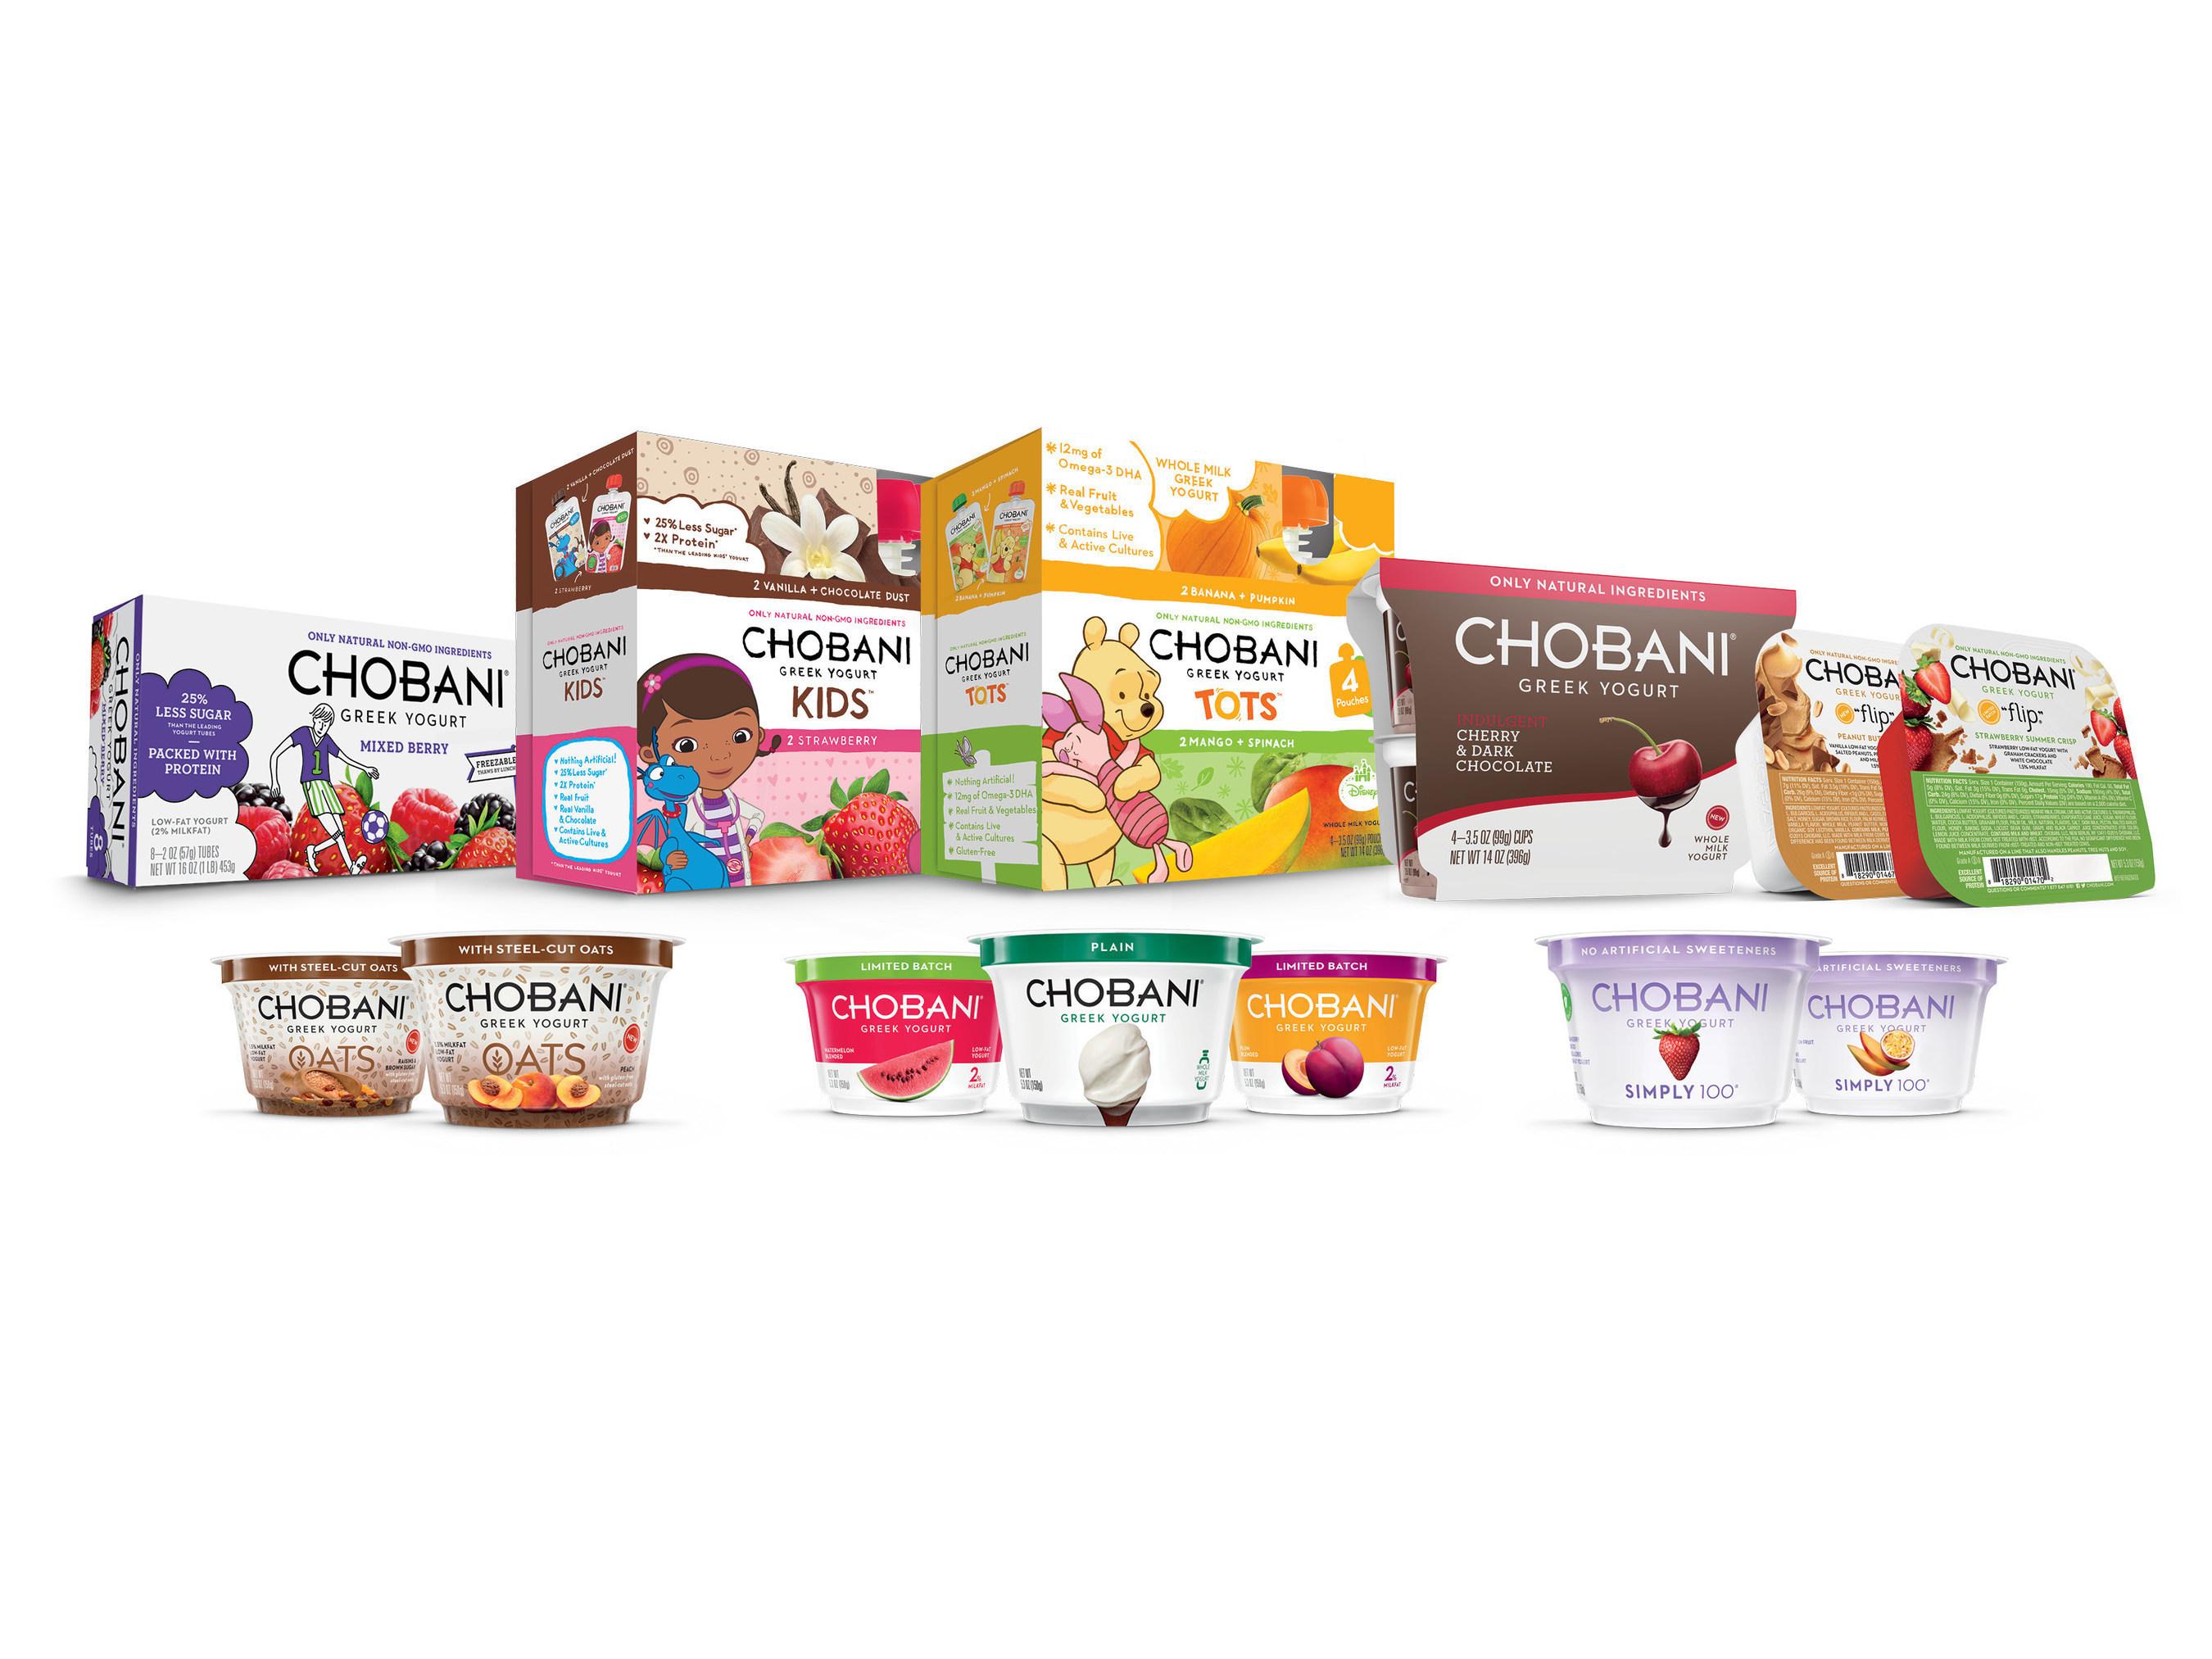 Chobani, America's No. 1-selling Greek Yogurt brand, announces new products across its entire portfolio-including new Chobani Oats, Chobani Simply 100, Chobani Flip, Limited Batch Chobani Greek Yogurt, Chobani Kids Greek Yogurt Tubes and Chobani Indulgent.